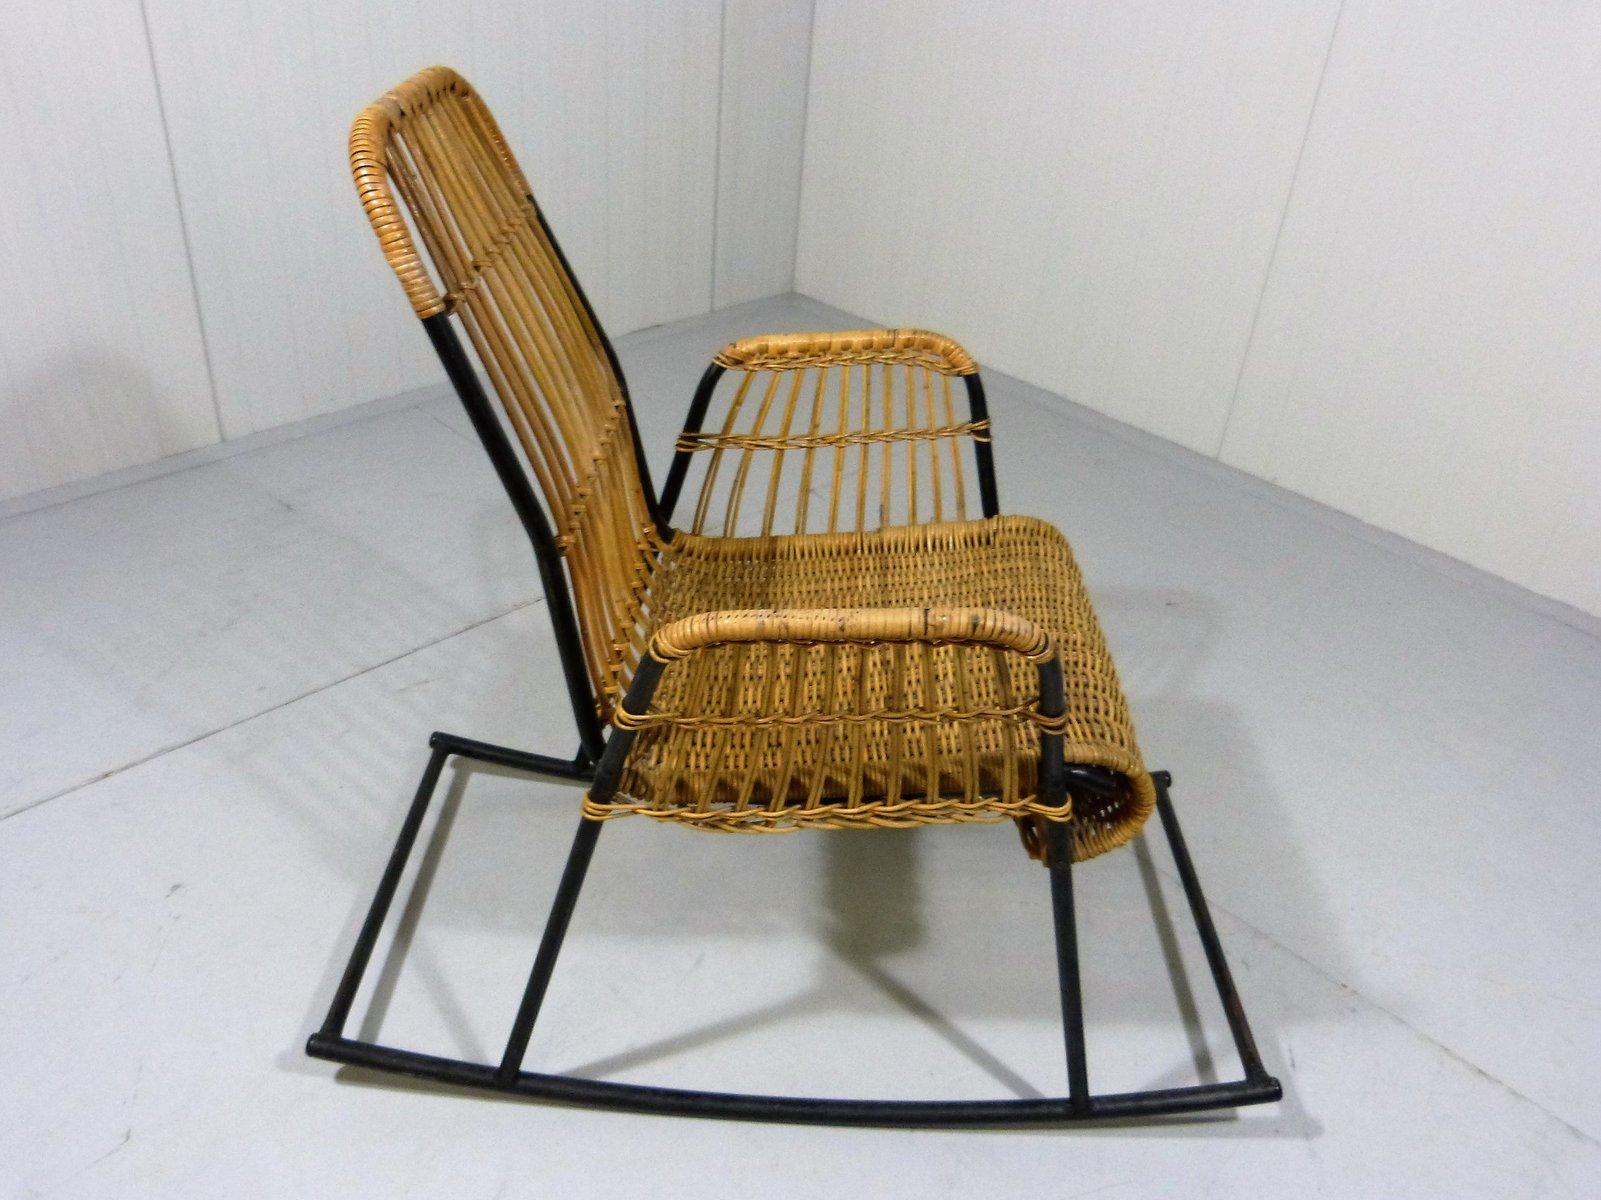 vintage rattan stahl schaukelstuhl bei pamono kaufen. Black Bedroom Furniture Sets. Home Design Ideas